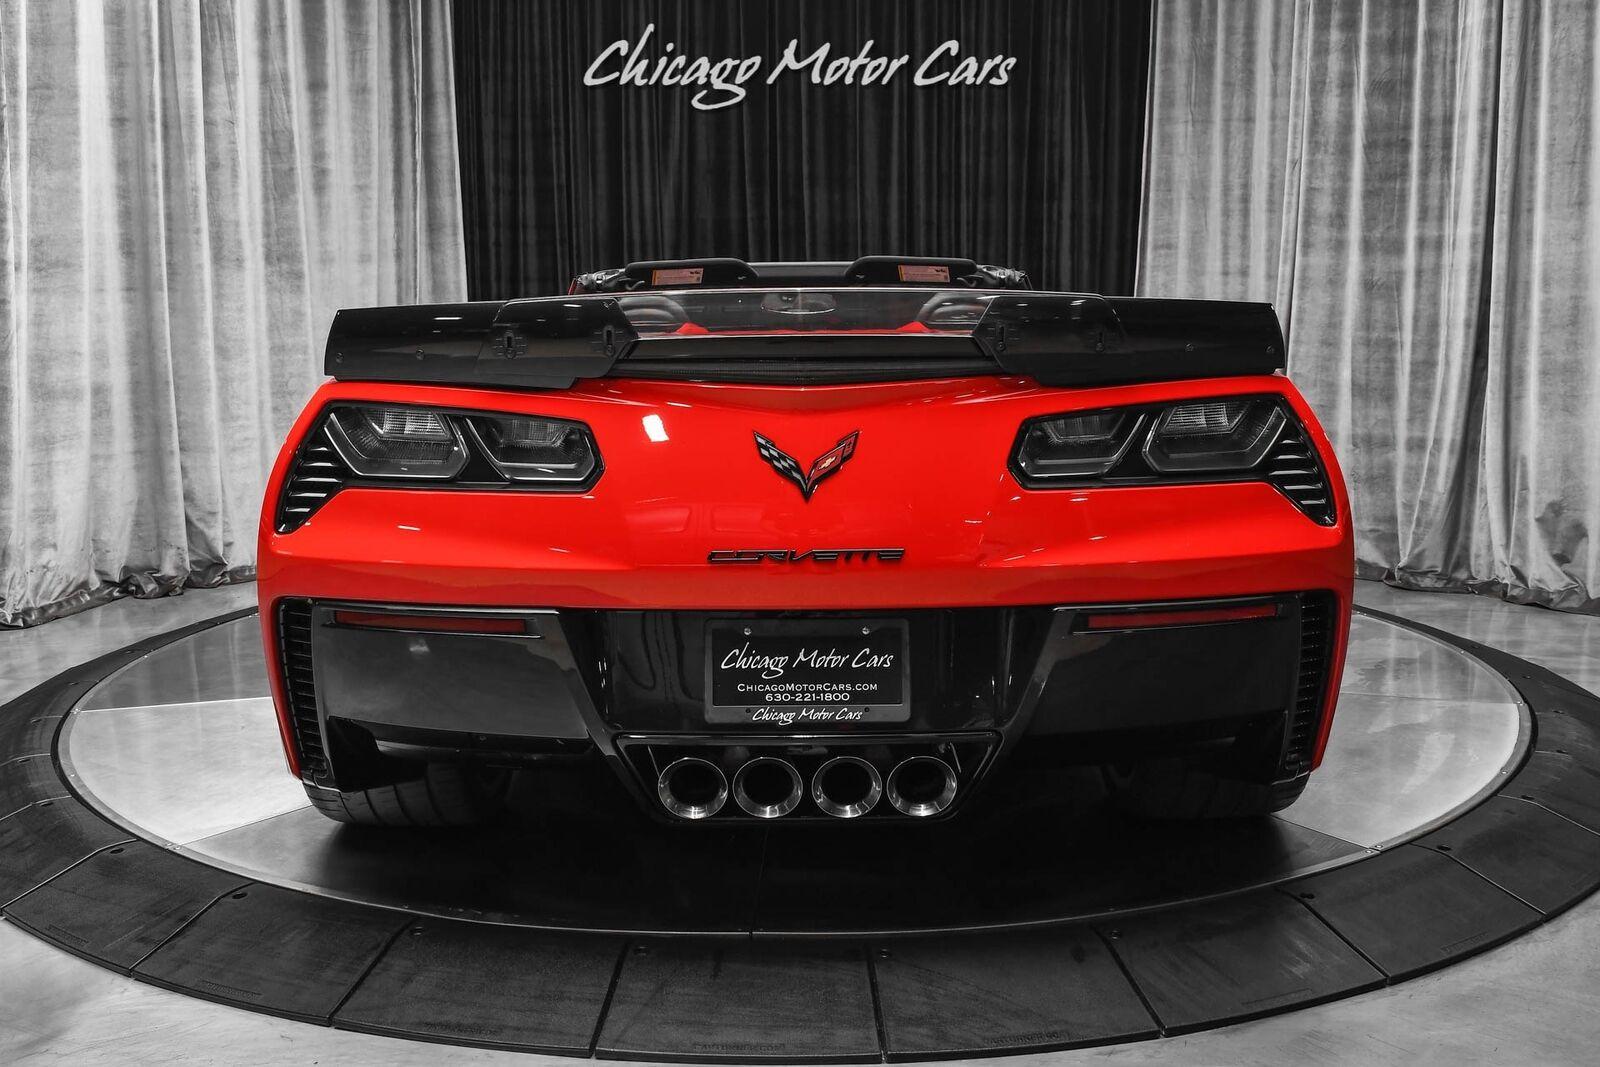 2015 Red Chevrolet Corvette Z06 2LZ | C7 Corvette Photo 4